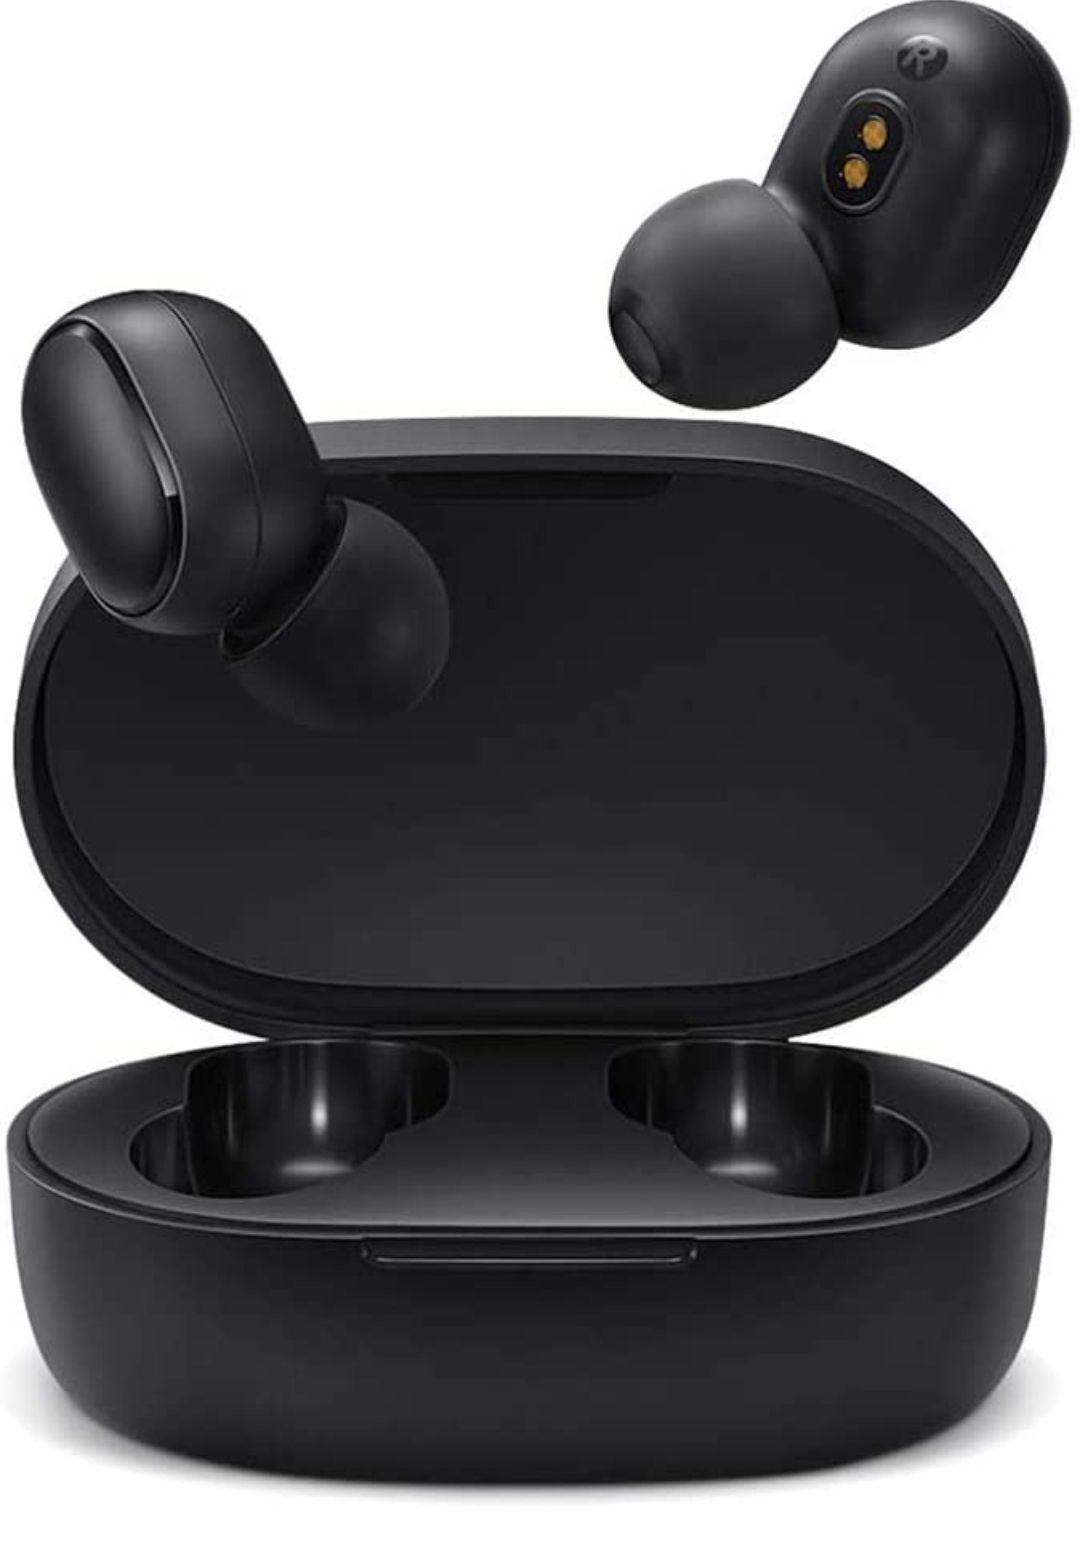 Xiaomi Mi True Wireless Earbuds Basic 2 Headphones - £13.25 + £4.49 Non Prime (UK Mainland) Sold By Amazon EU @ Amazon